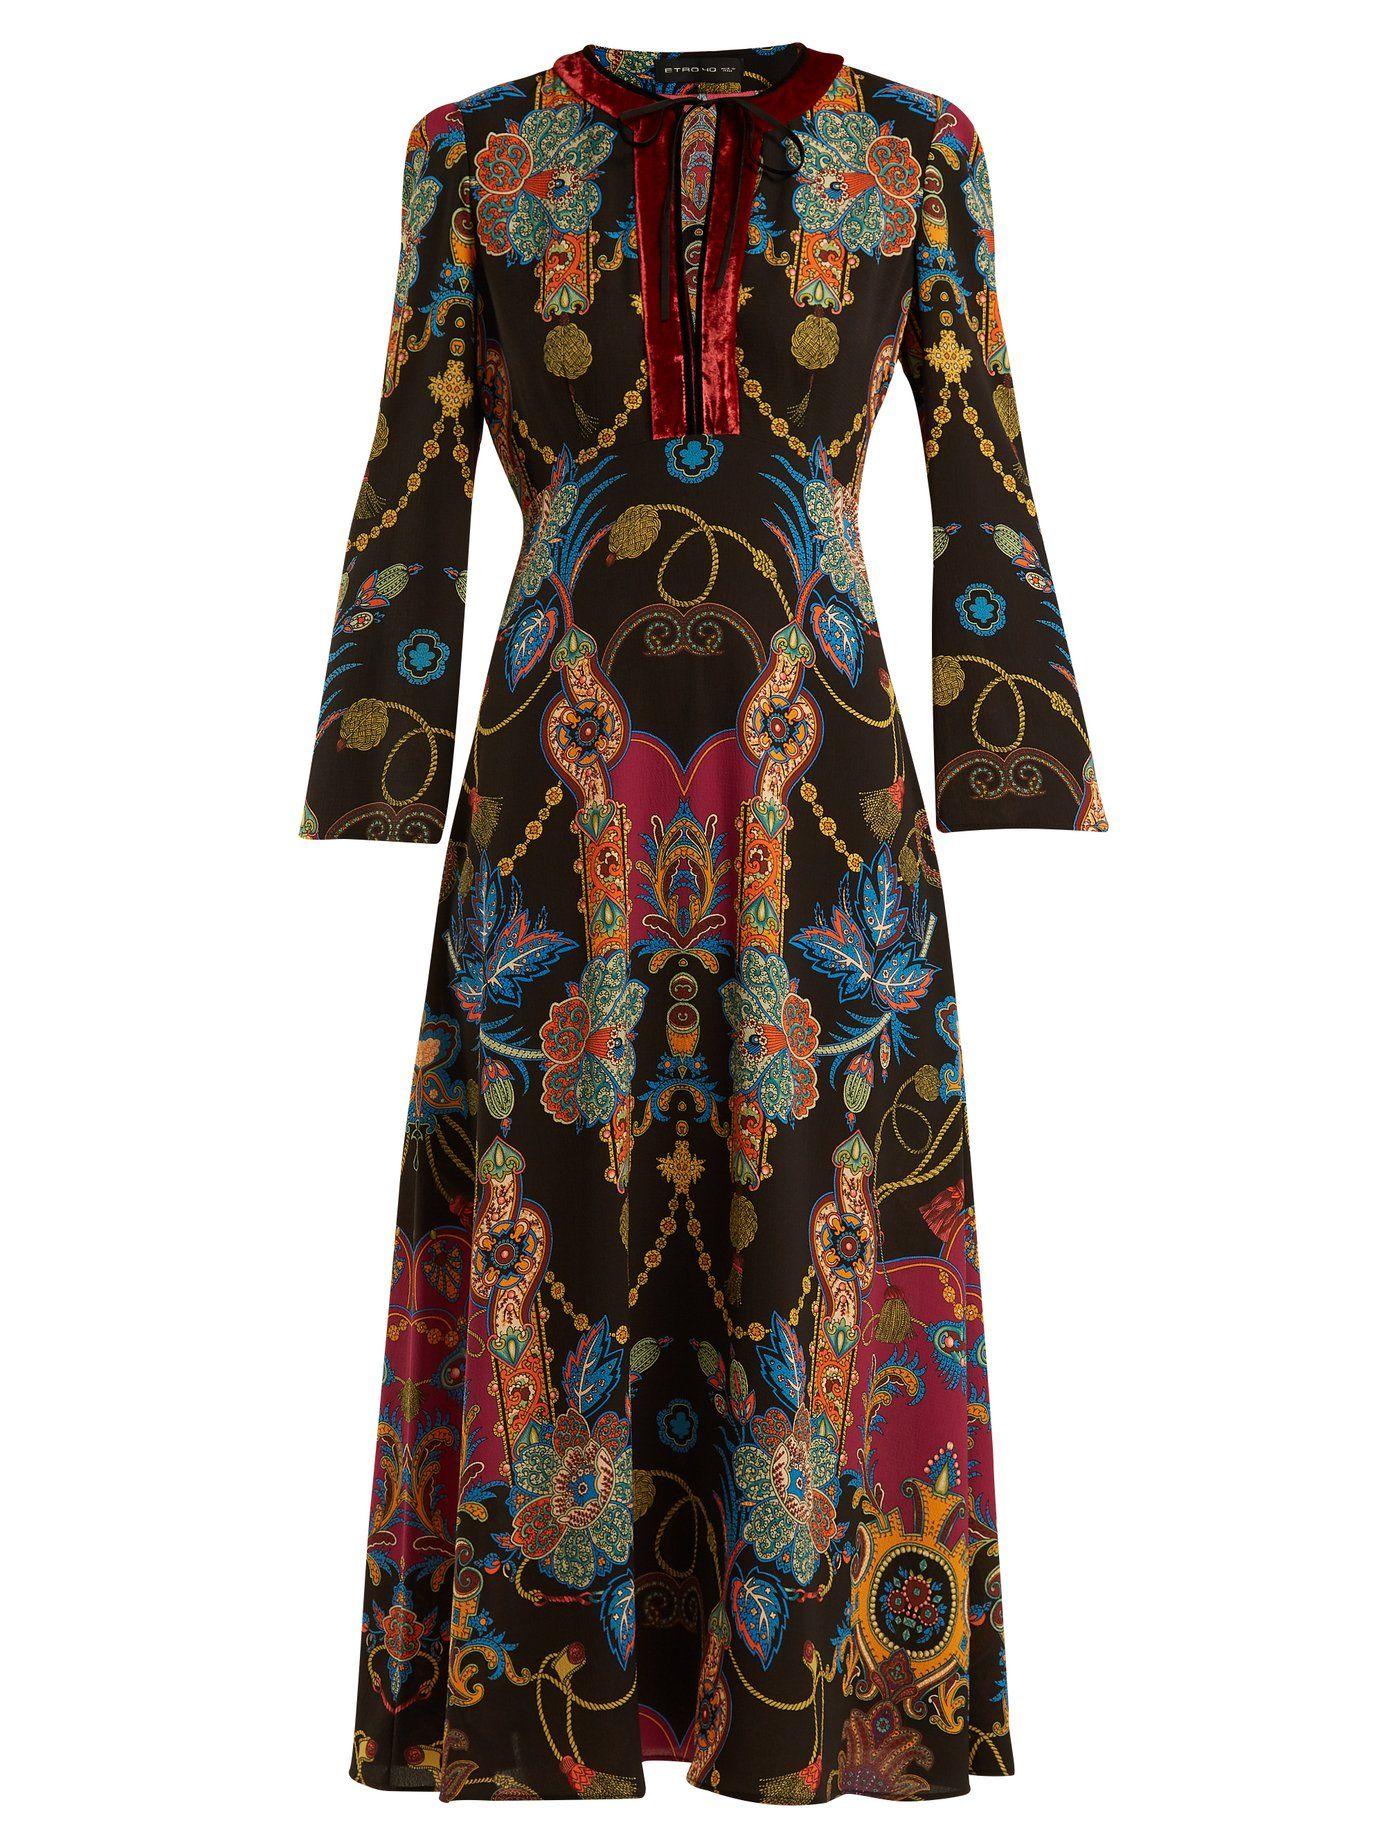 super popular efe58 20ba9 ETRO Rosolite Paisley Print Tie Neck Black Dress | Girly ...